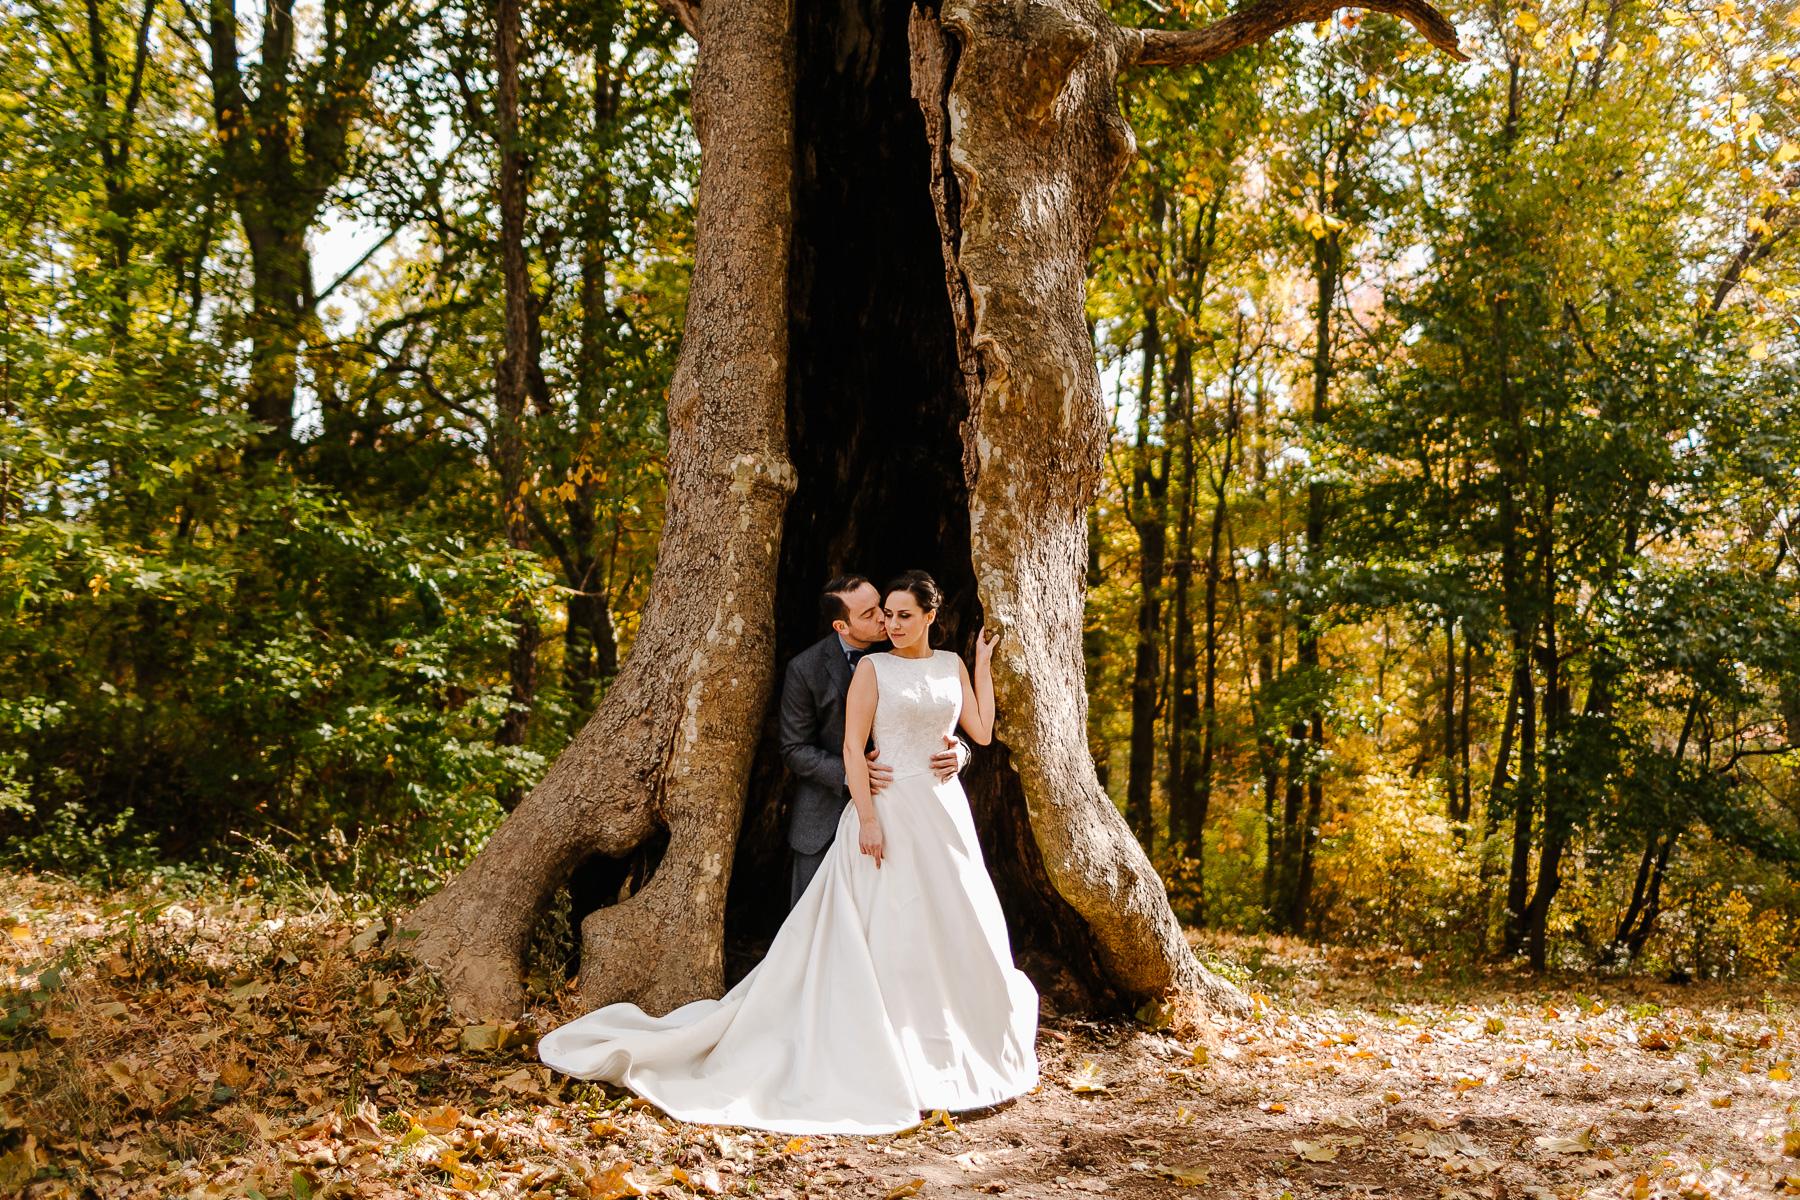 43-Laurita Winery Wedding New Jersey Wedding Photographer Laurita Winery Weddings Longbrook Photography.jpg